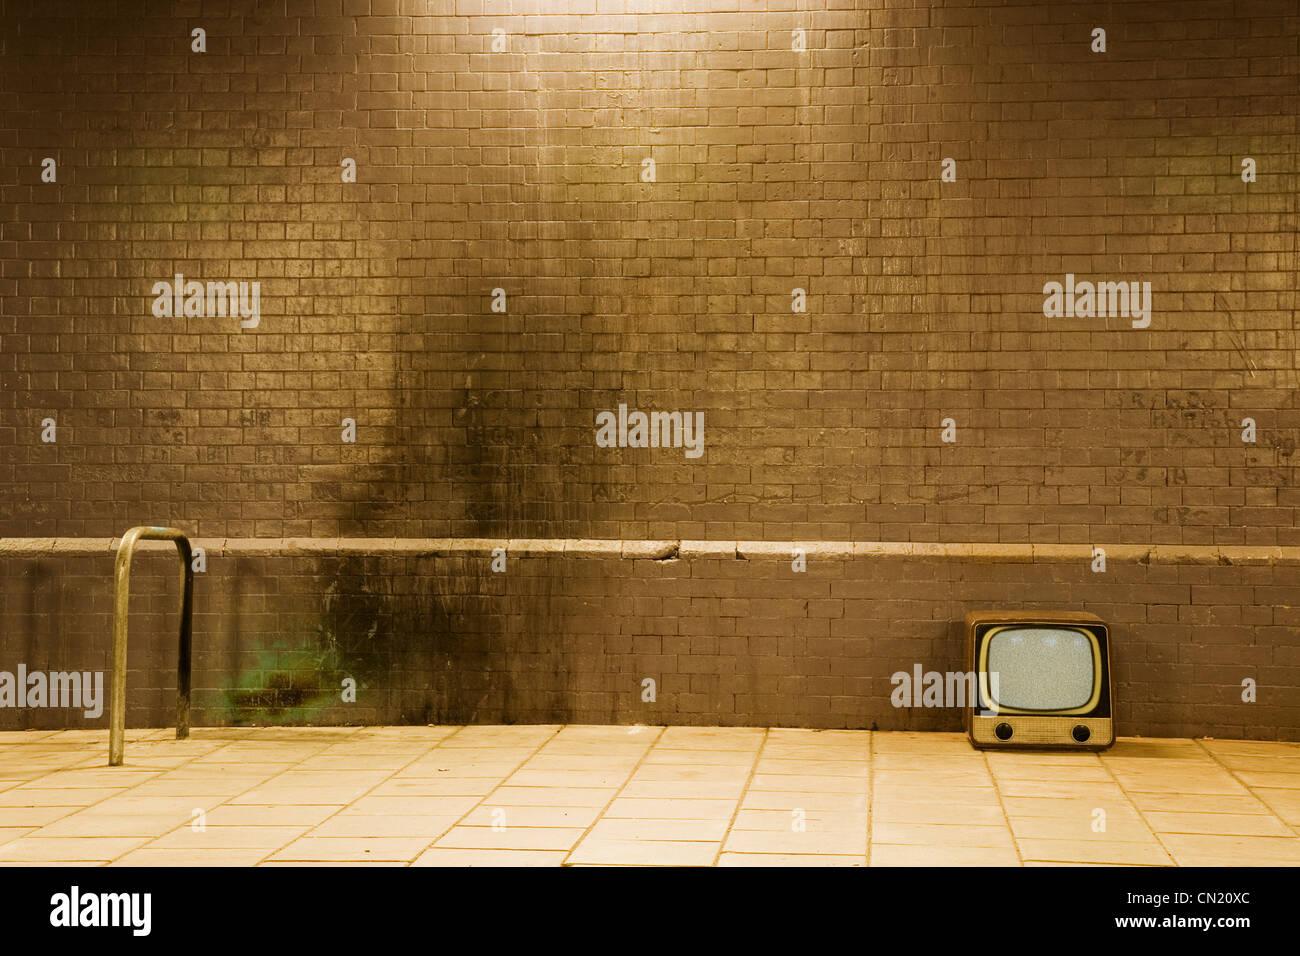 Retro television by brick wall - Stock Image